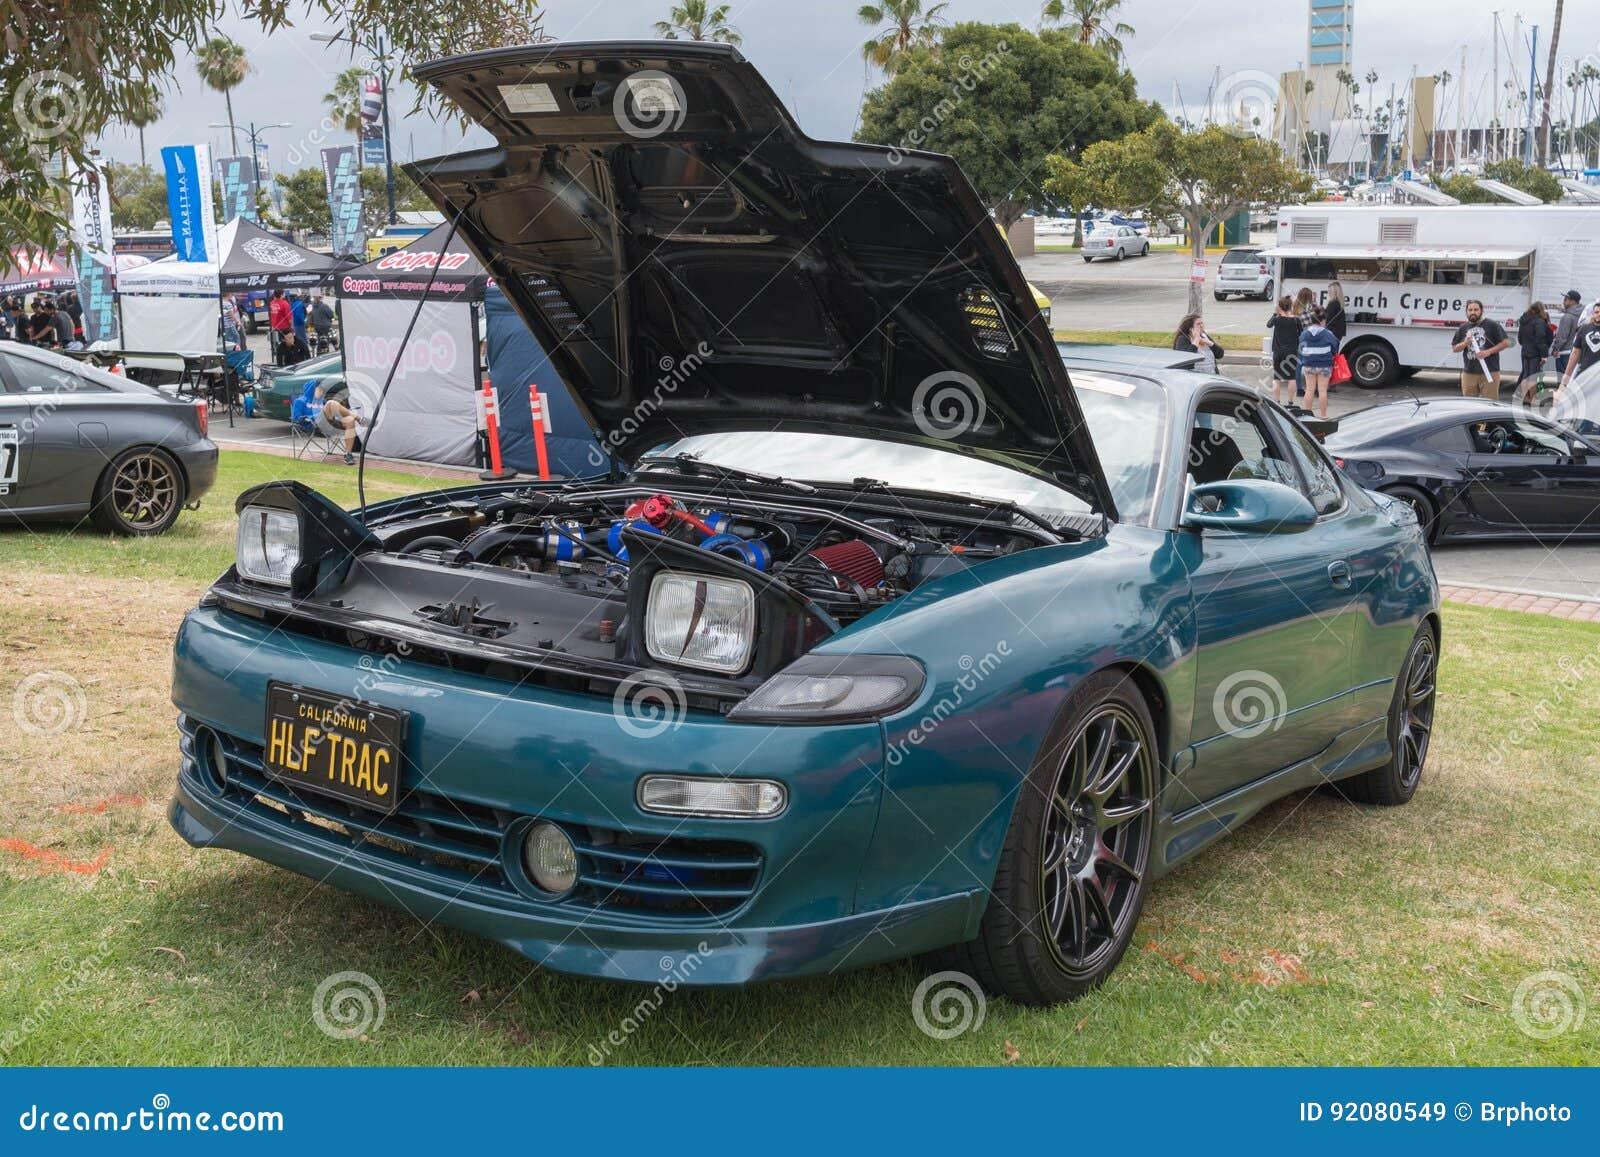 Kekurangan Toyota Celica 1992 Spesifikasi